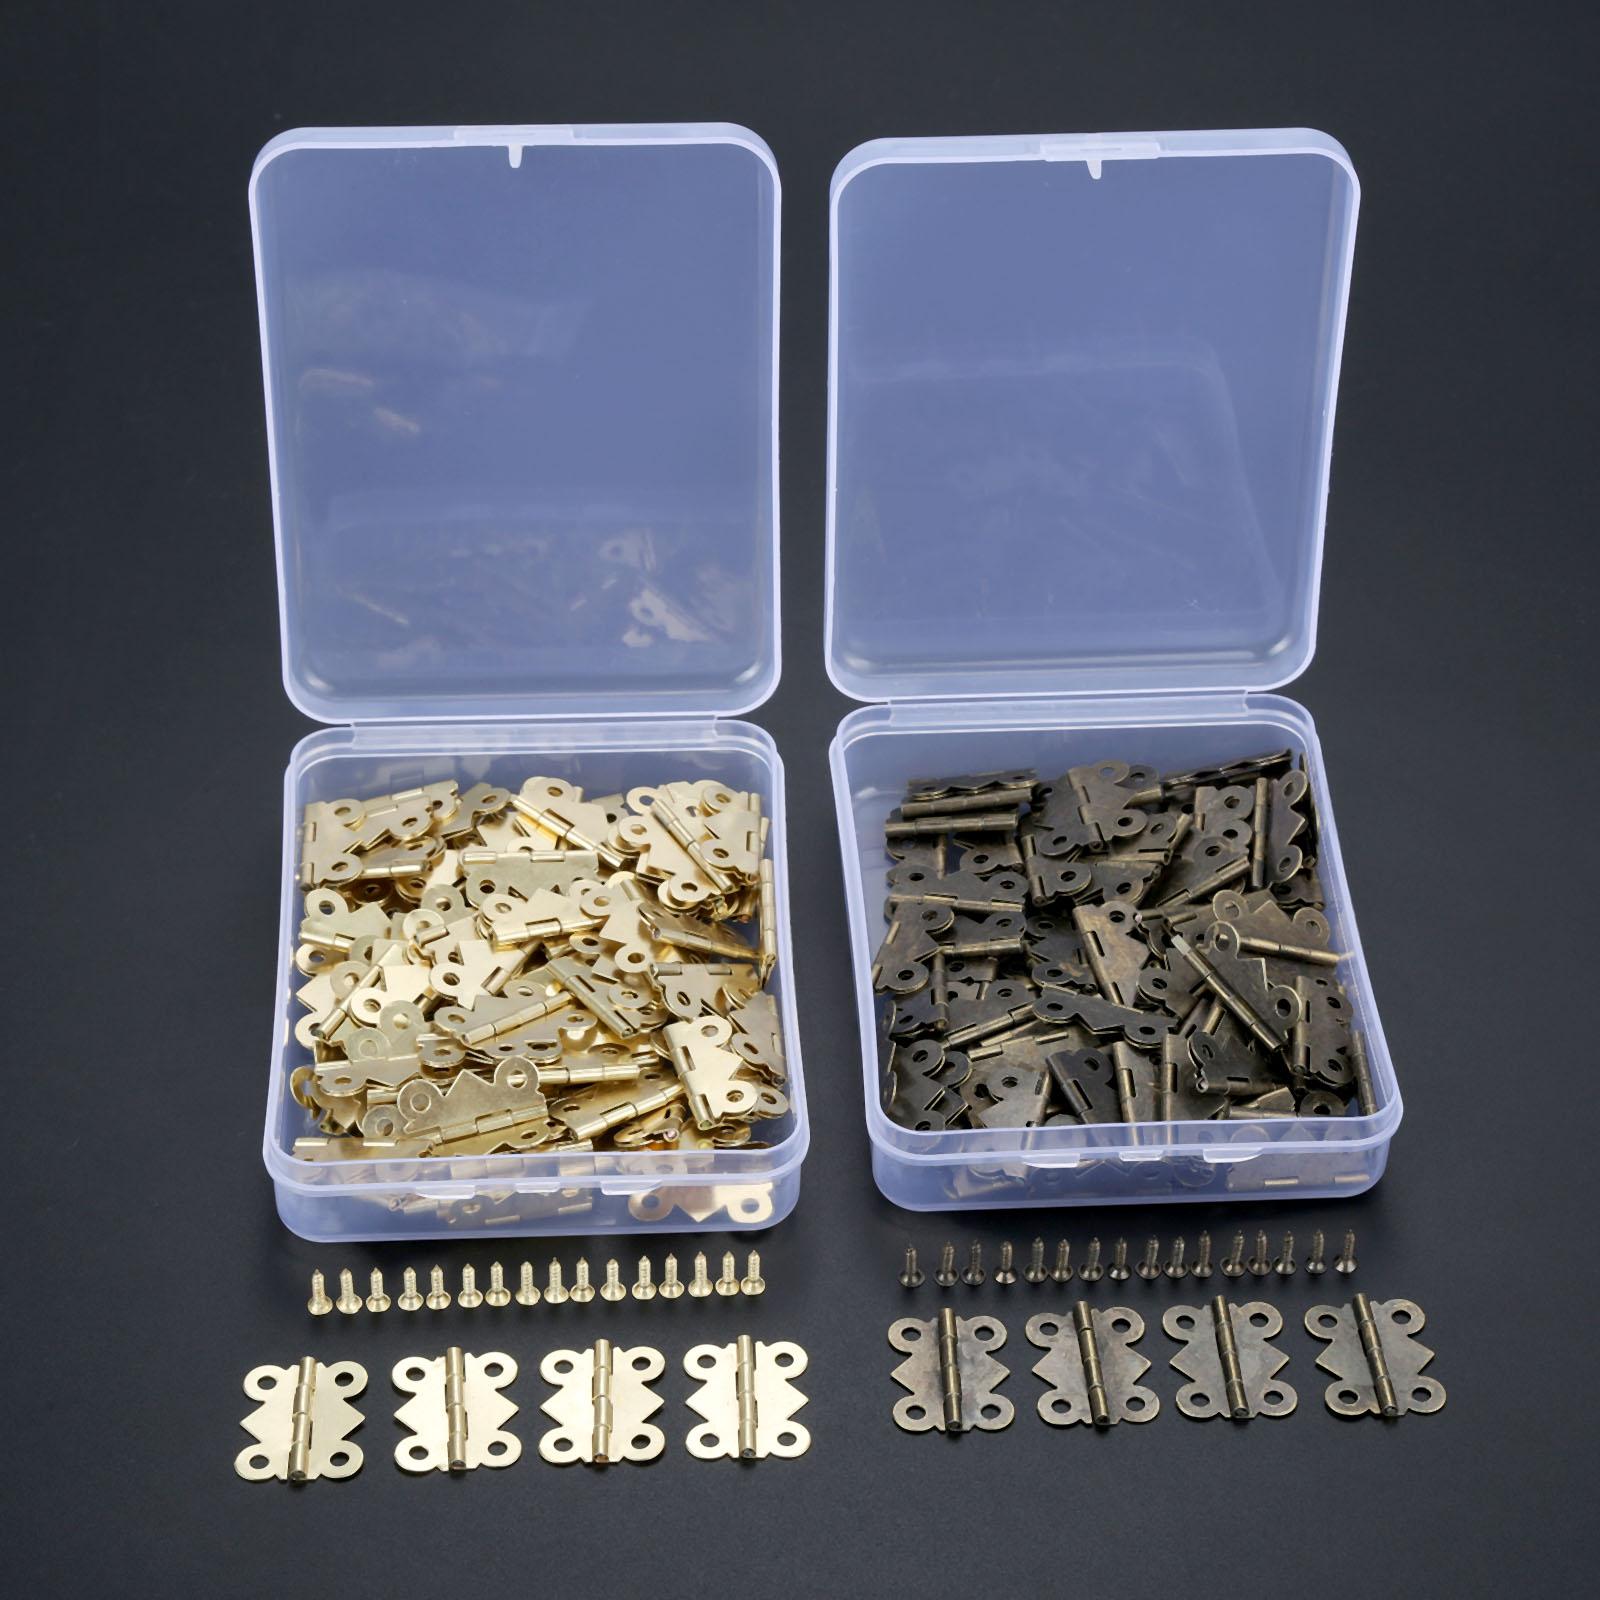 DRELD 100 Uds 25x20mm Mini bisagra de puerta de mariposa caja de joyería decorativa bisagra de herraje para muebles + tornillos + caja de almacenamiento